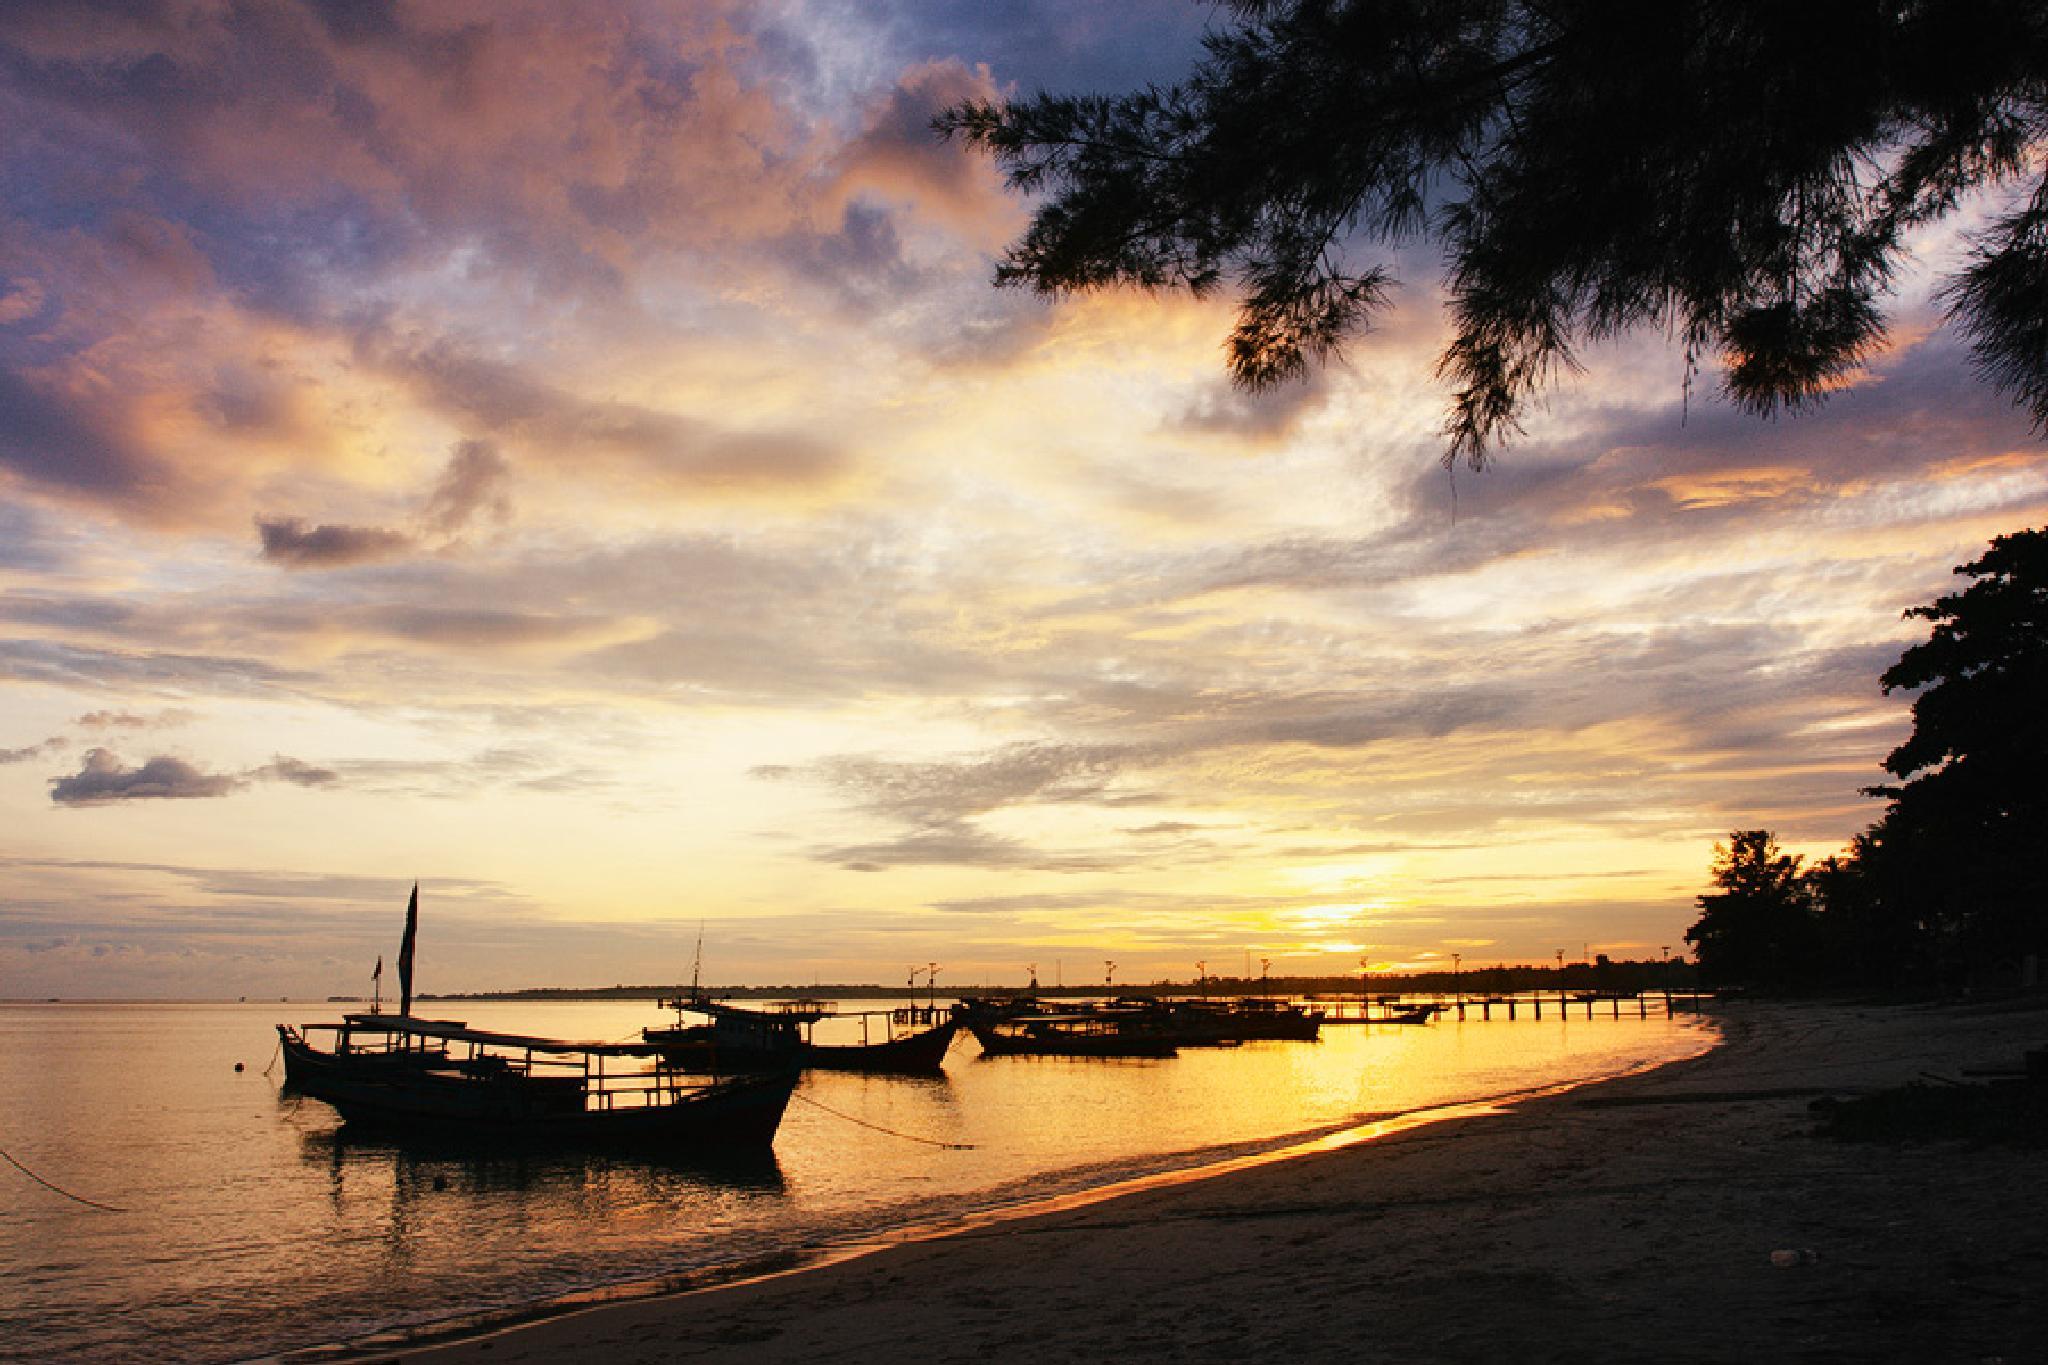 Tanjung Kalayar at Sunrise by Munawar Ainy